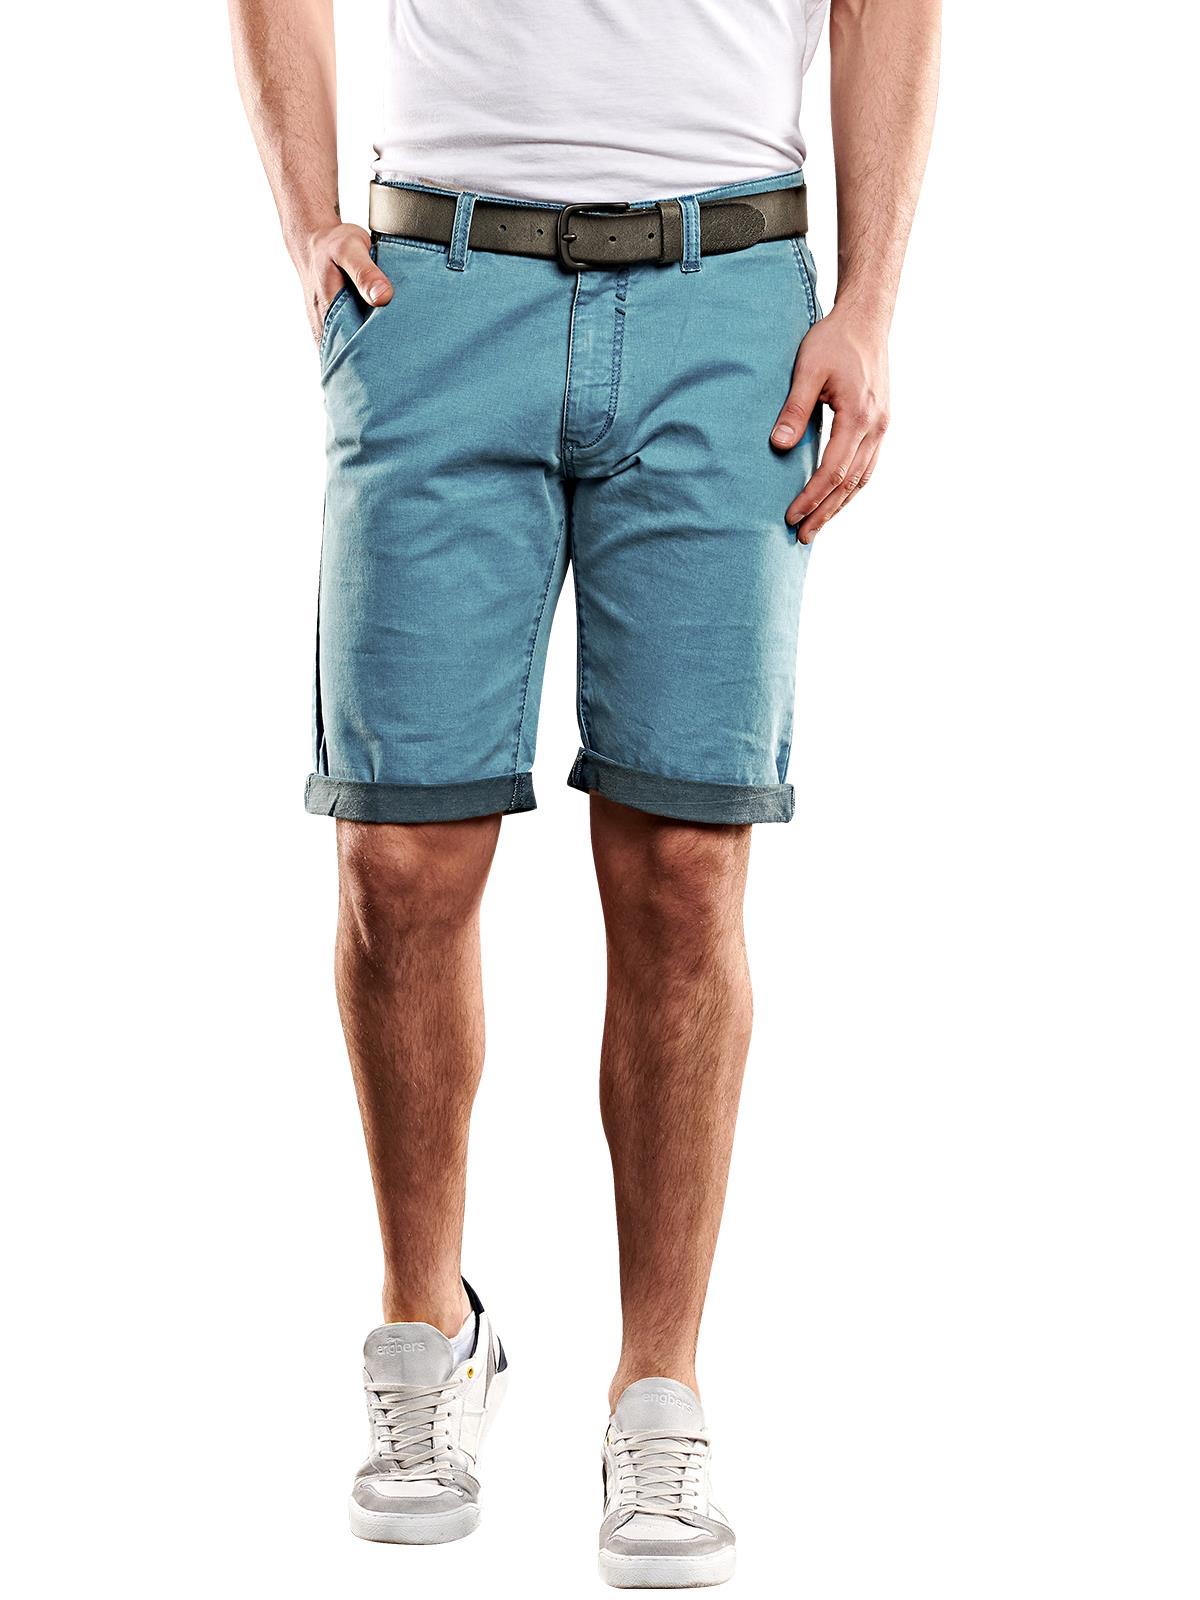 engbers Shorts 5 Pocket Preisvergleich